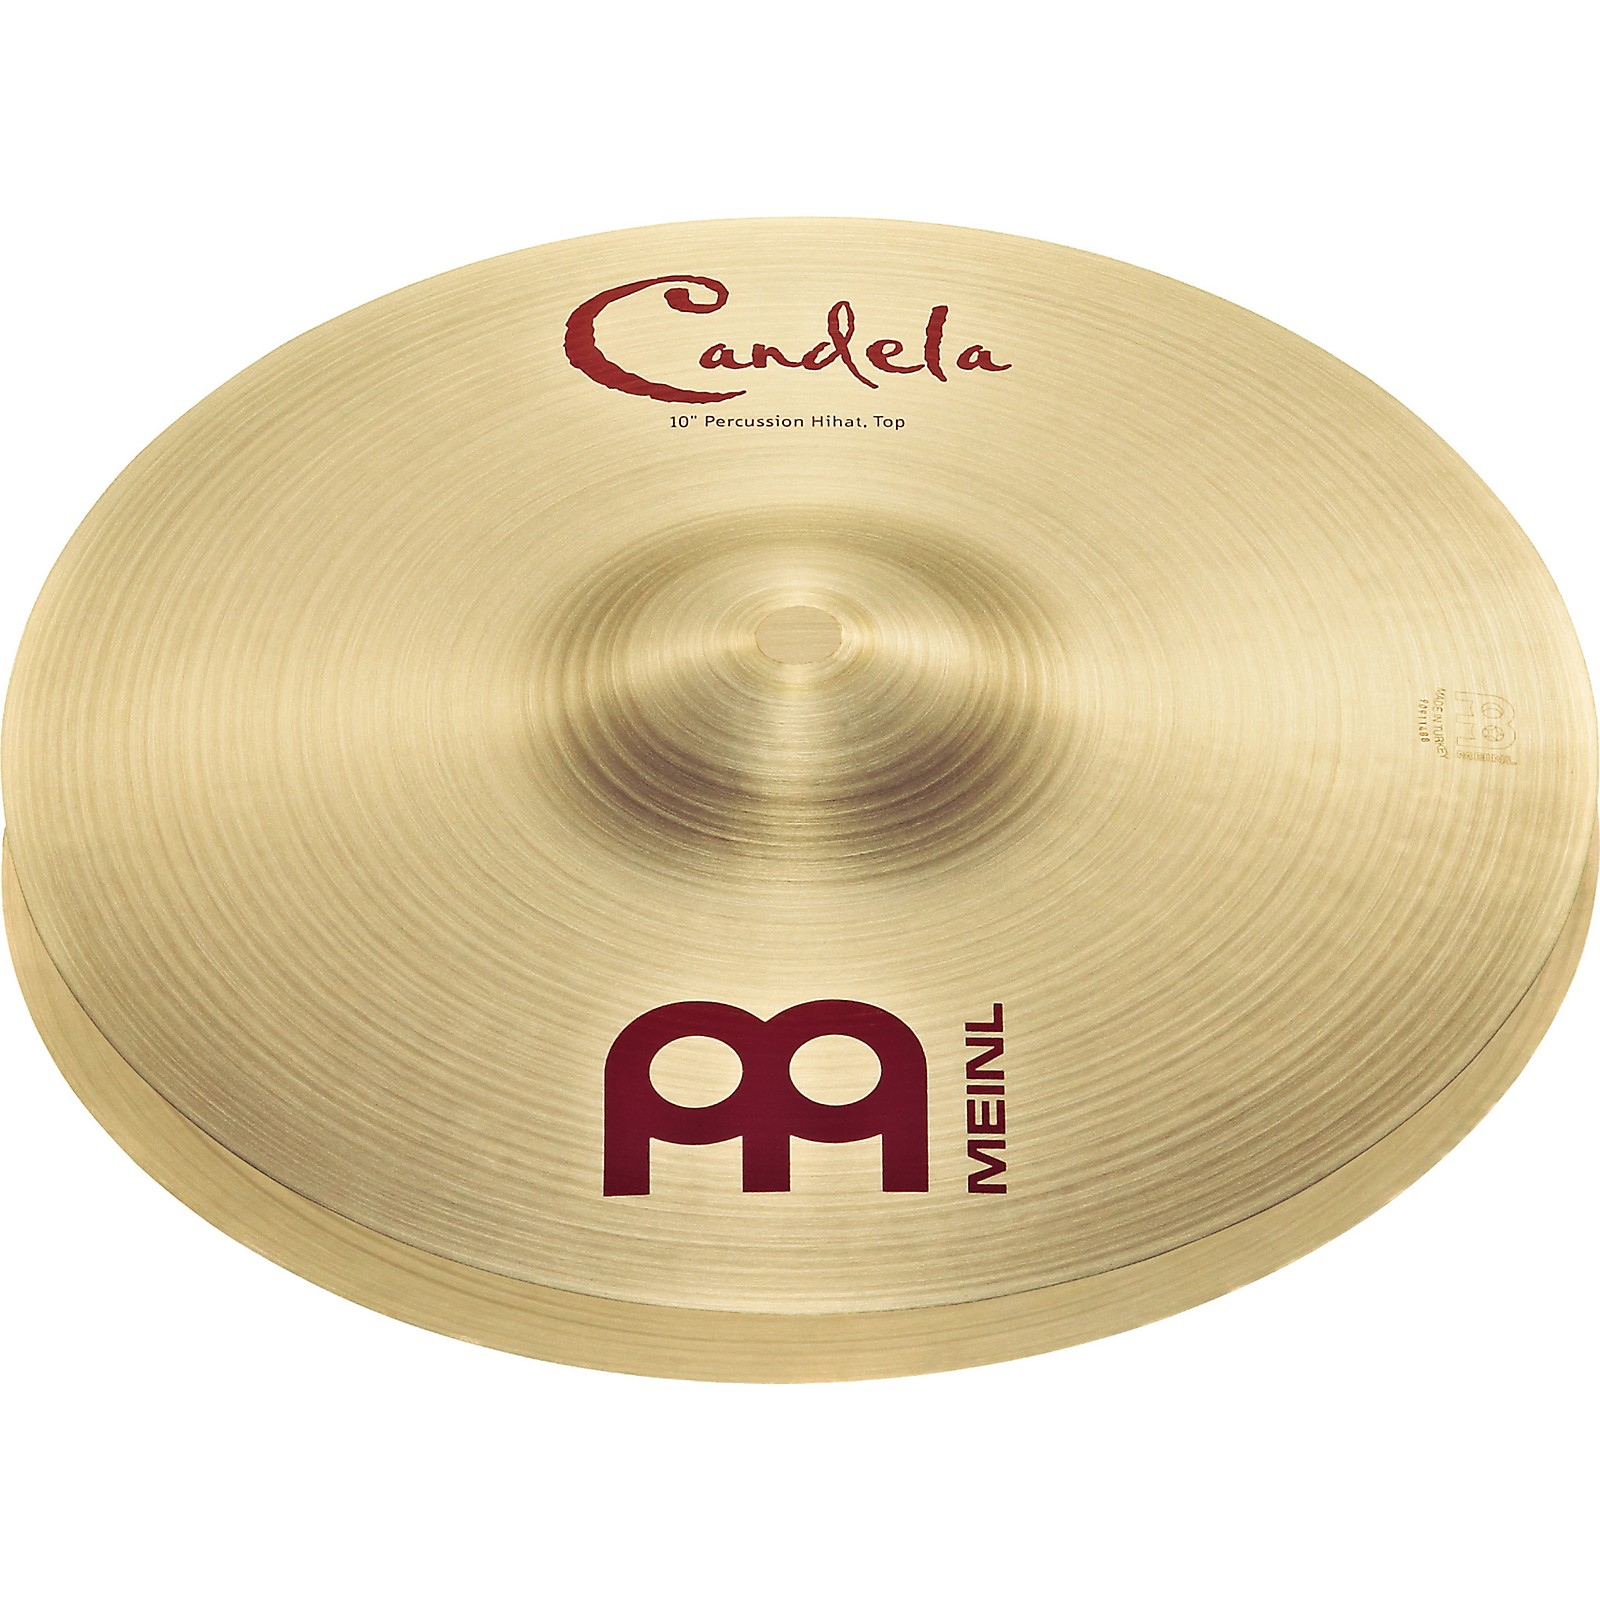 Meinl Candela Percussion Hi-hats